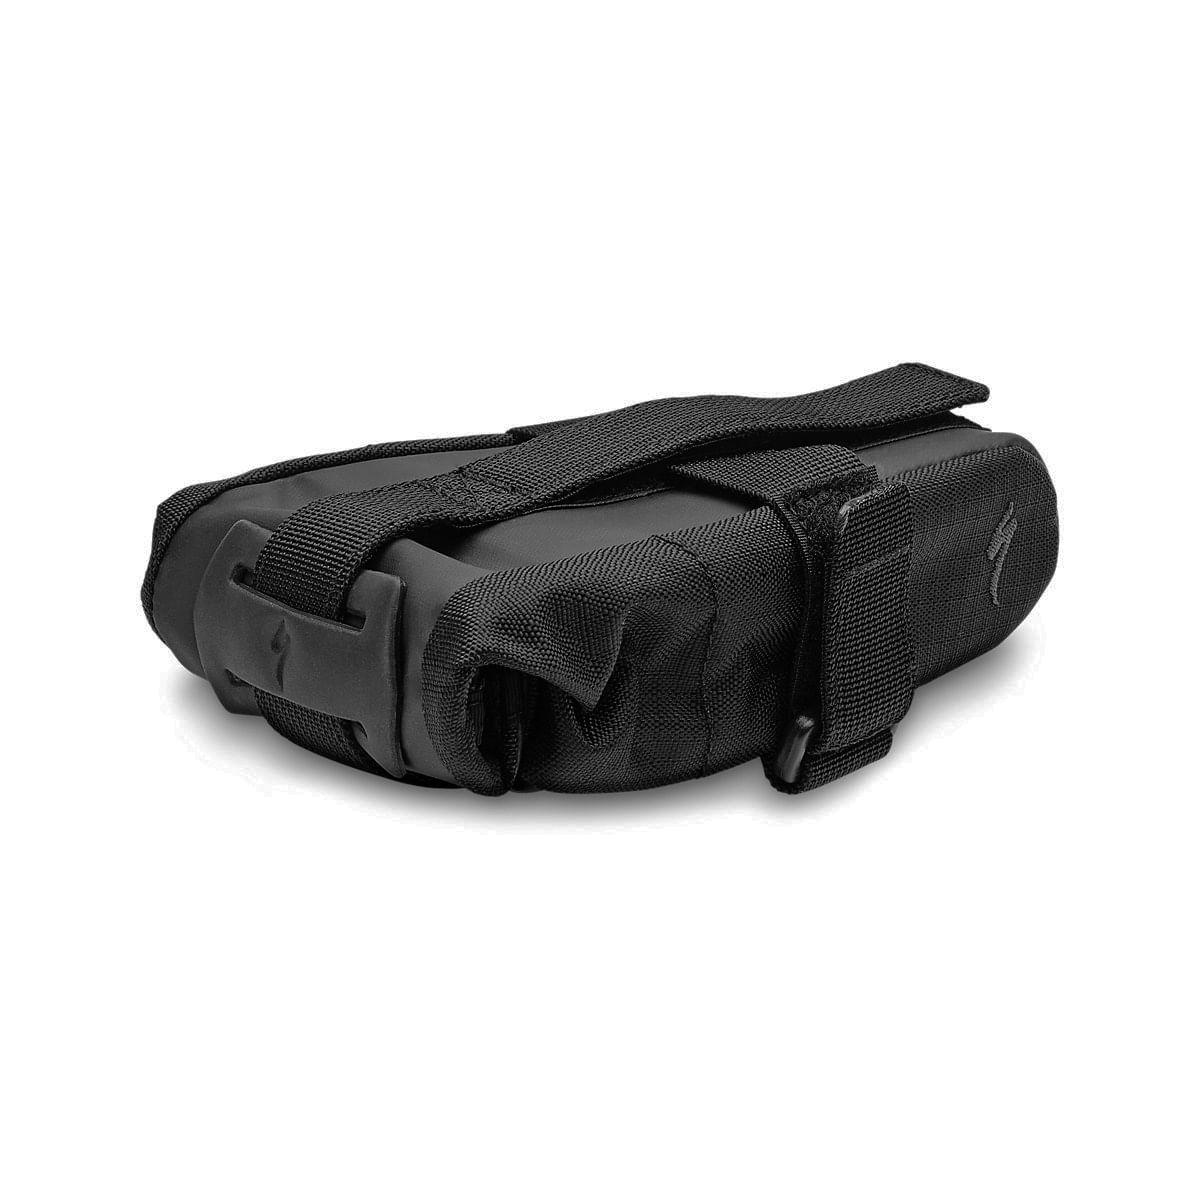 Bolsa-de-Selim-Impermeavel-Specialized-Seat-Pack-Medio---7121